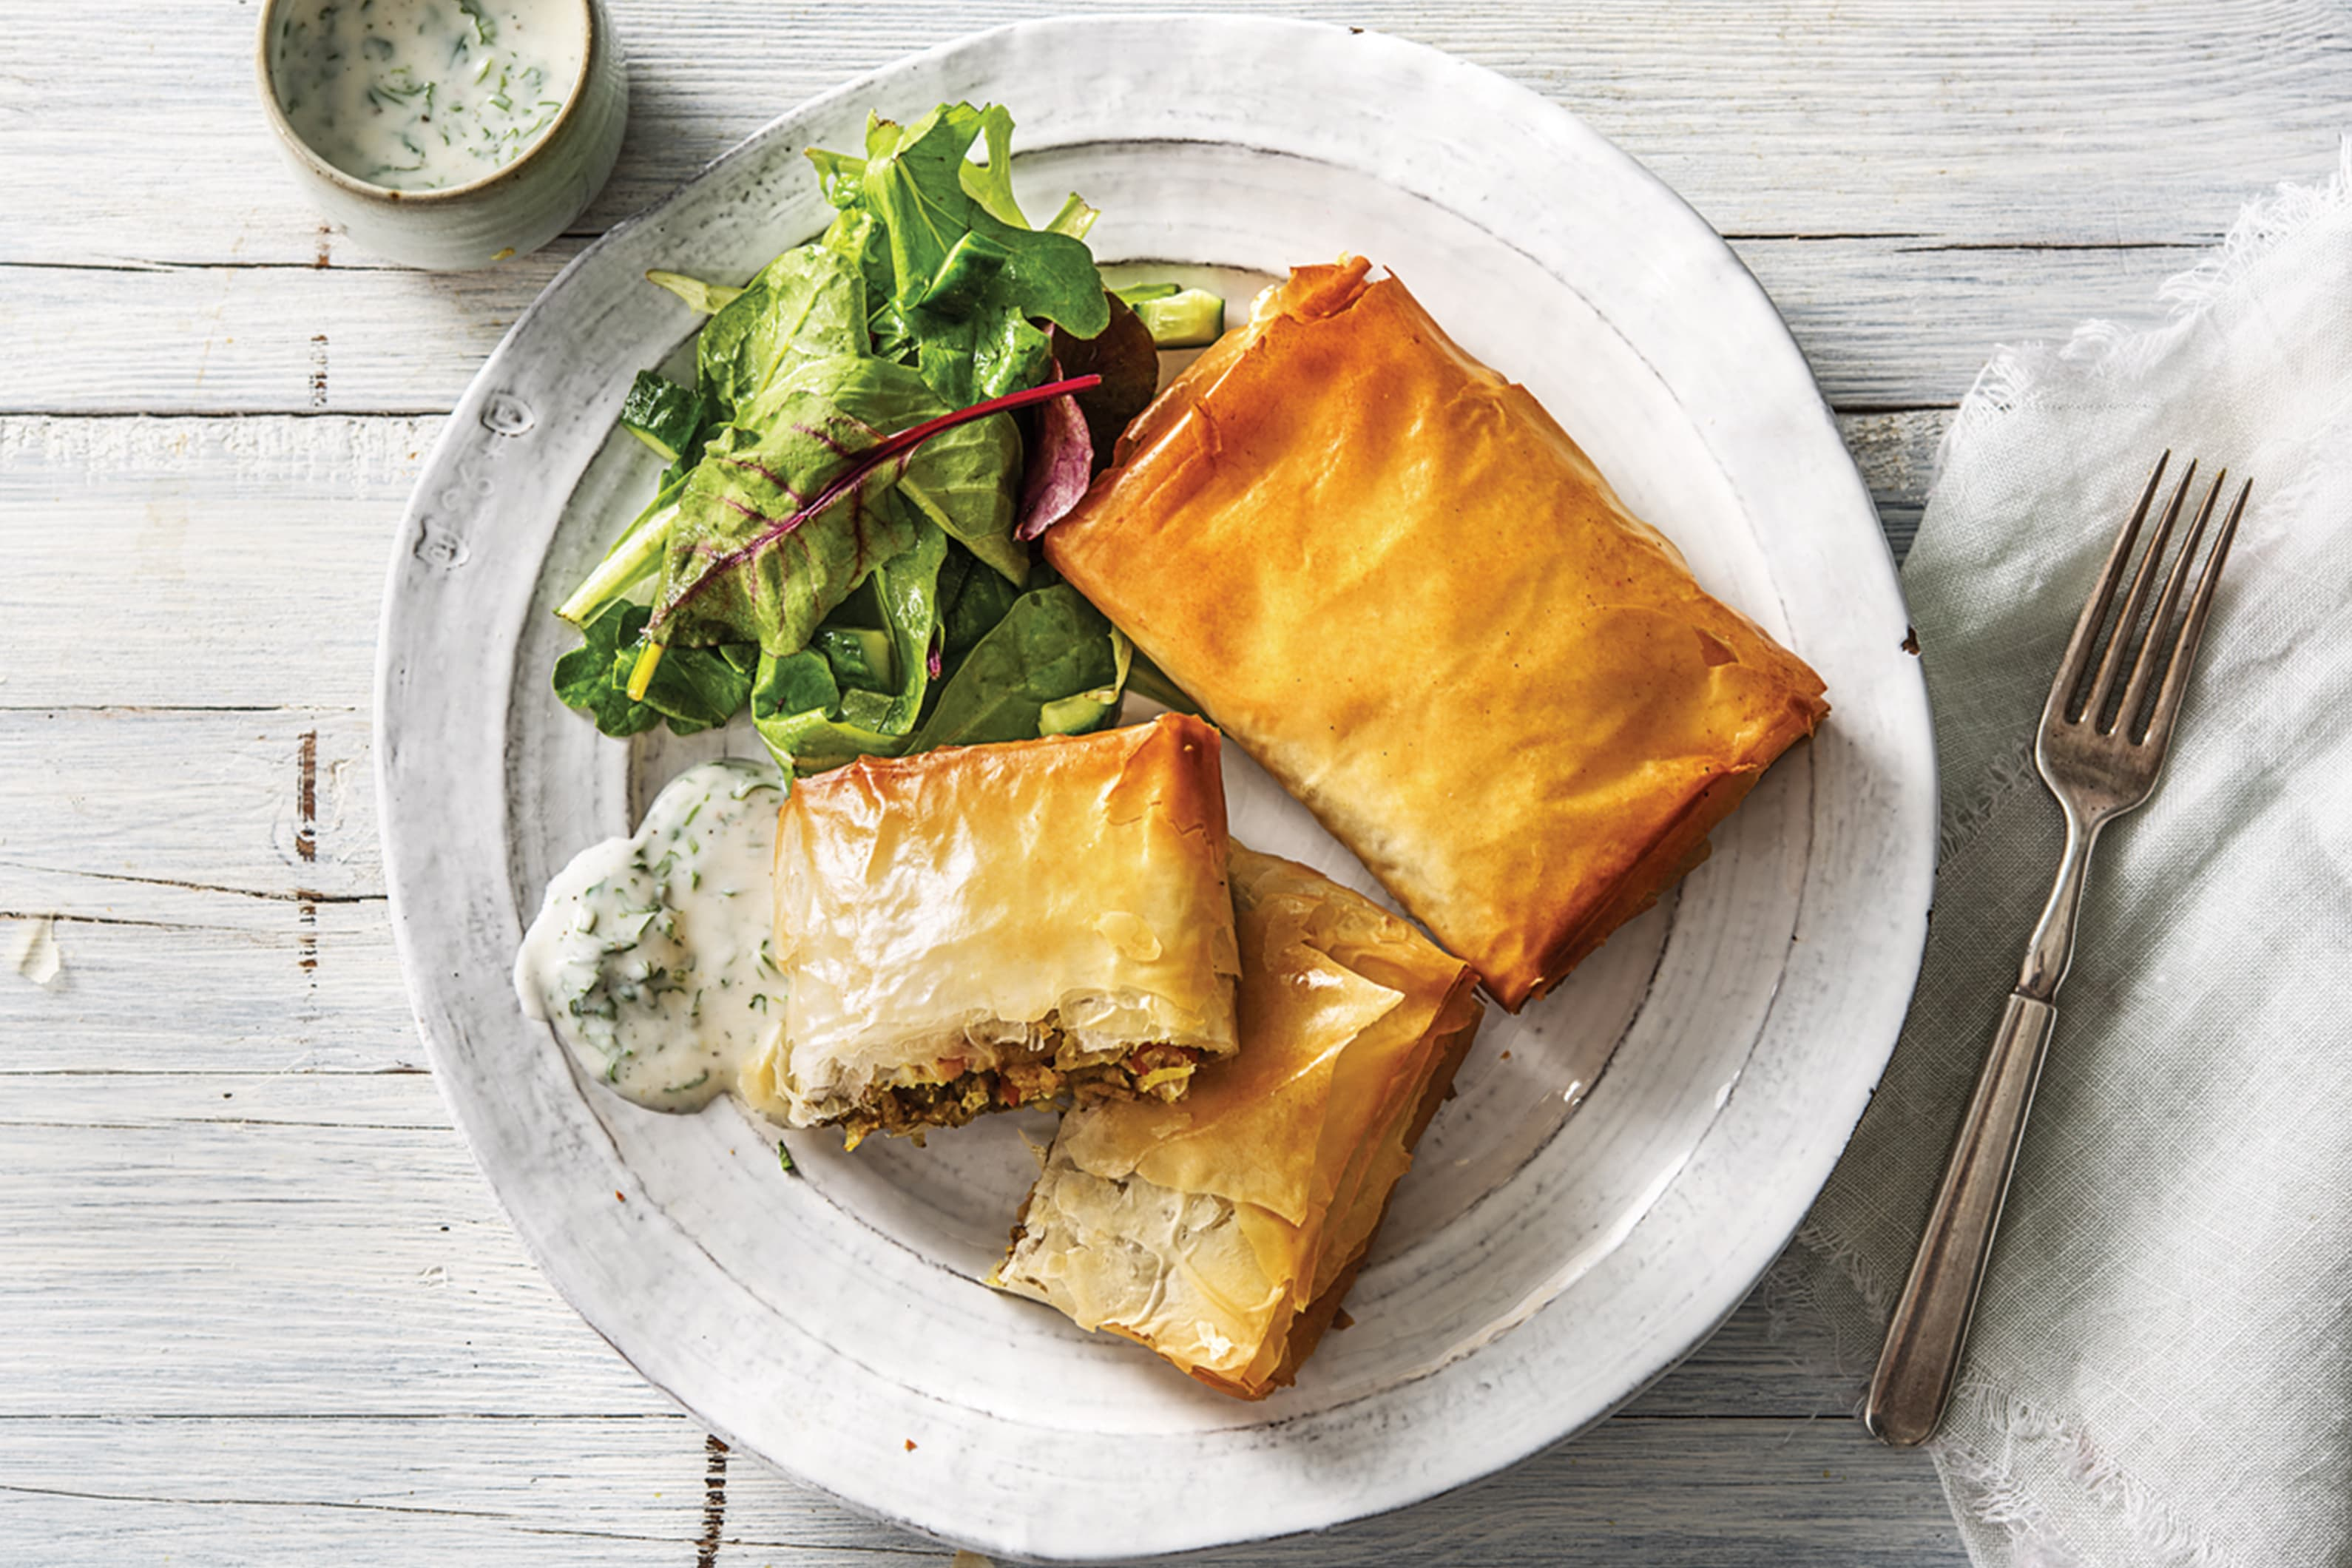 Cheat's Veggie Samosa Parcels